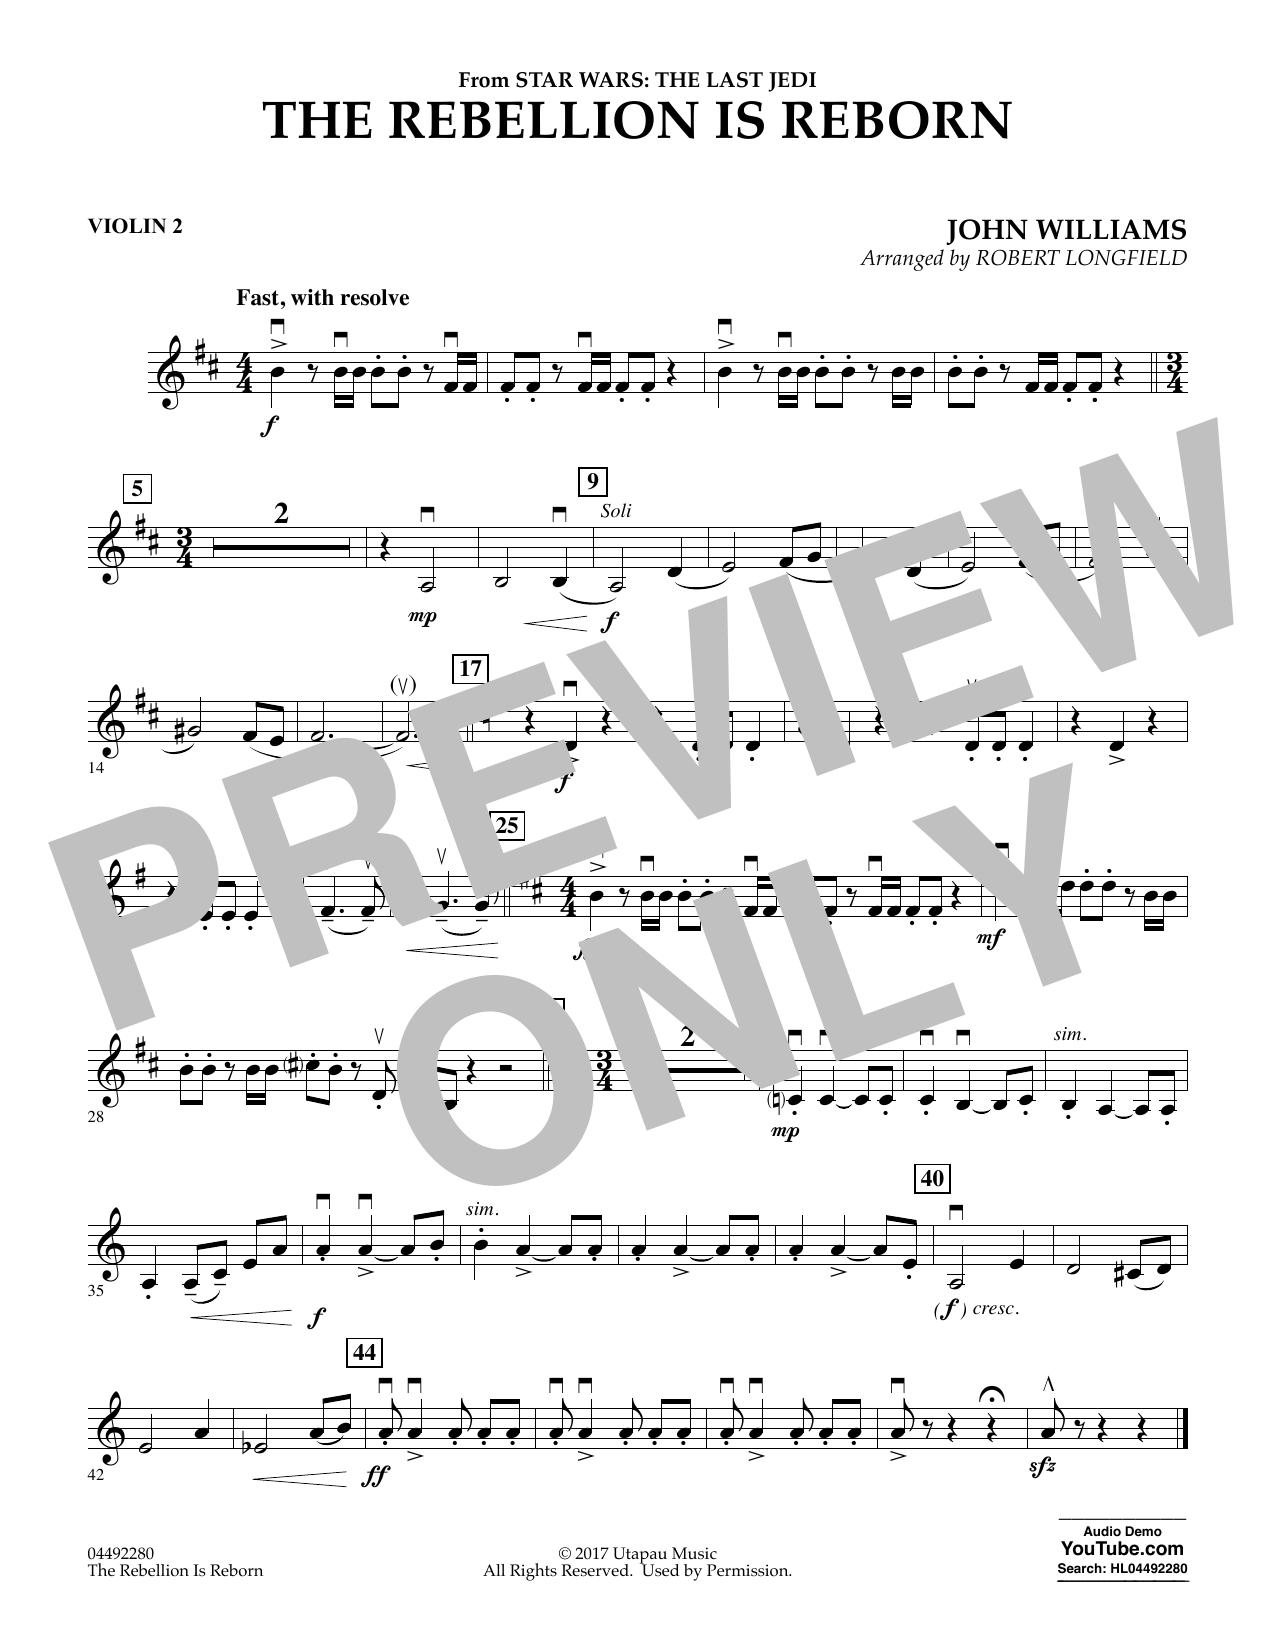 The Rebellion Is Reborn (from Star Wars: The Last Jedi) - Violin 2 (Orchestra)